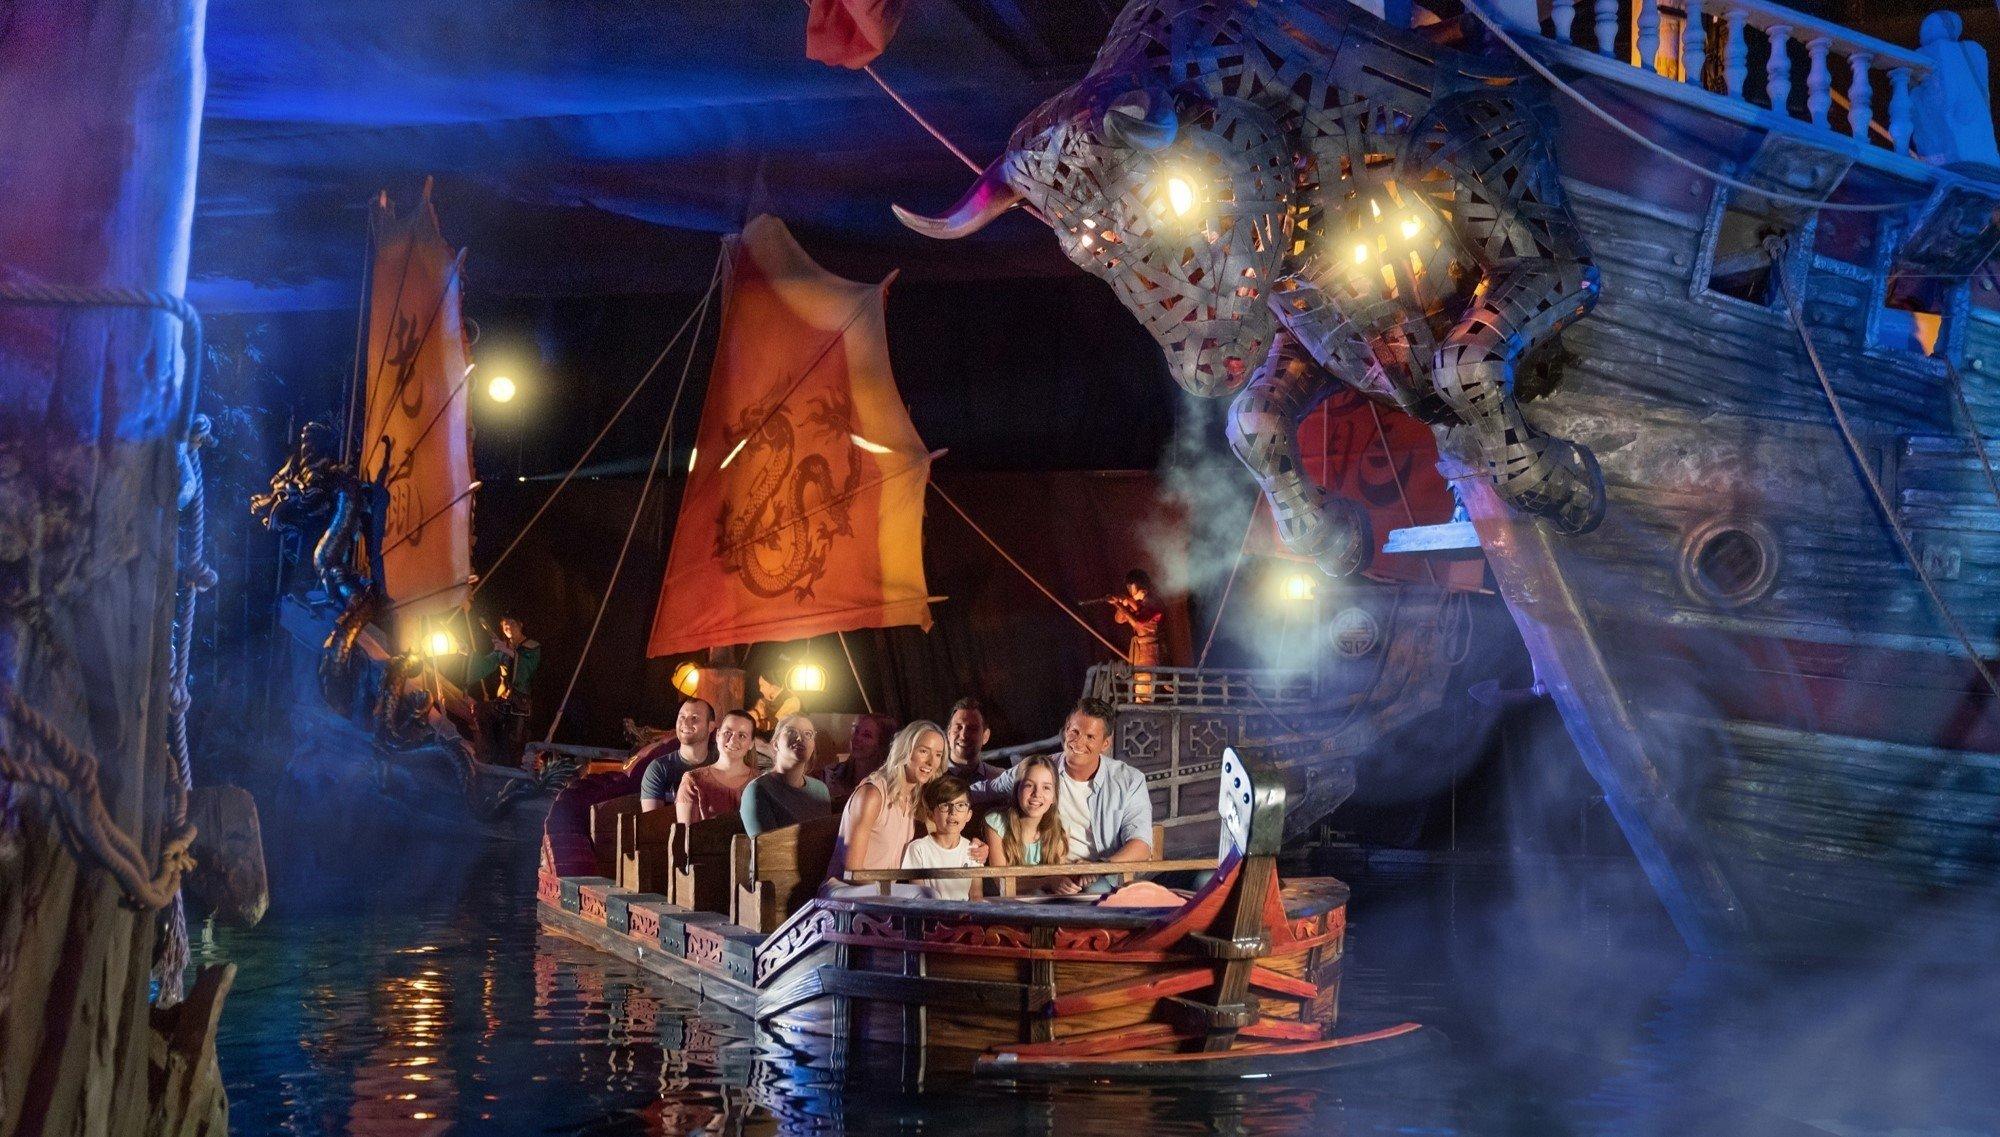 Pirates in Batavia en Europa Park: Opiniones e Info | PACommunity